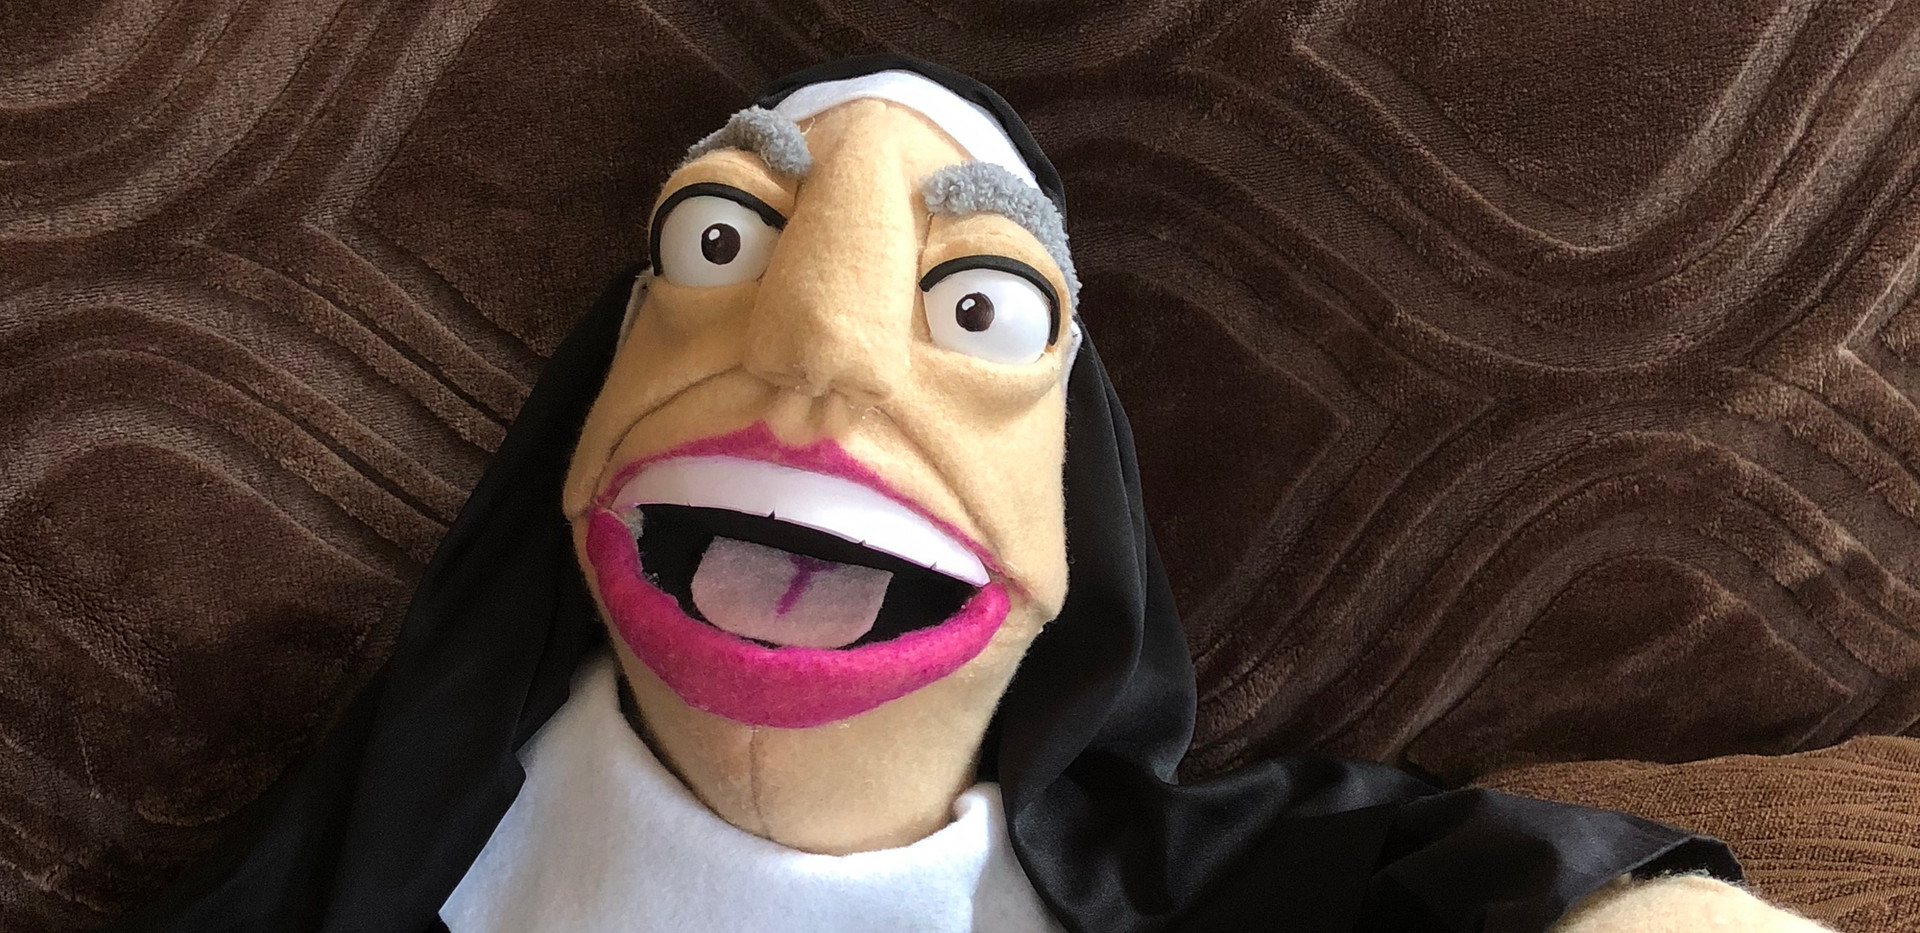 Sister Mary Annette